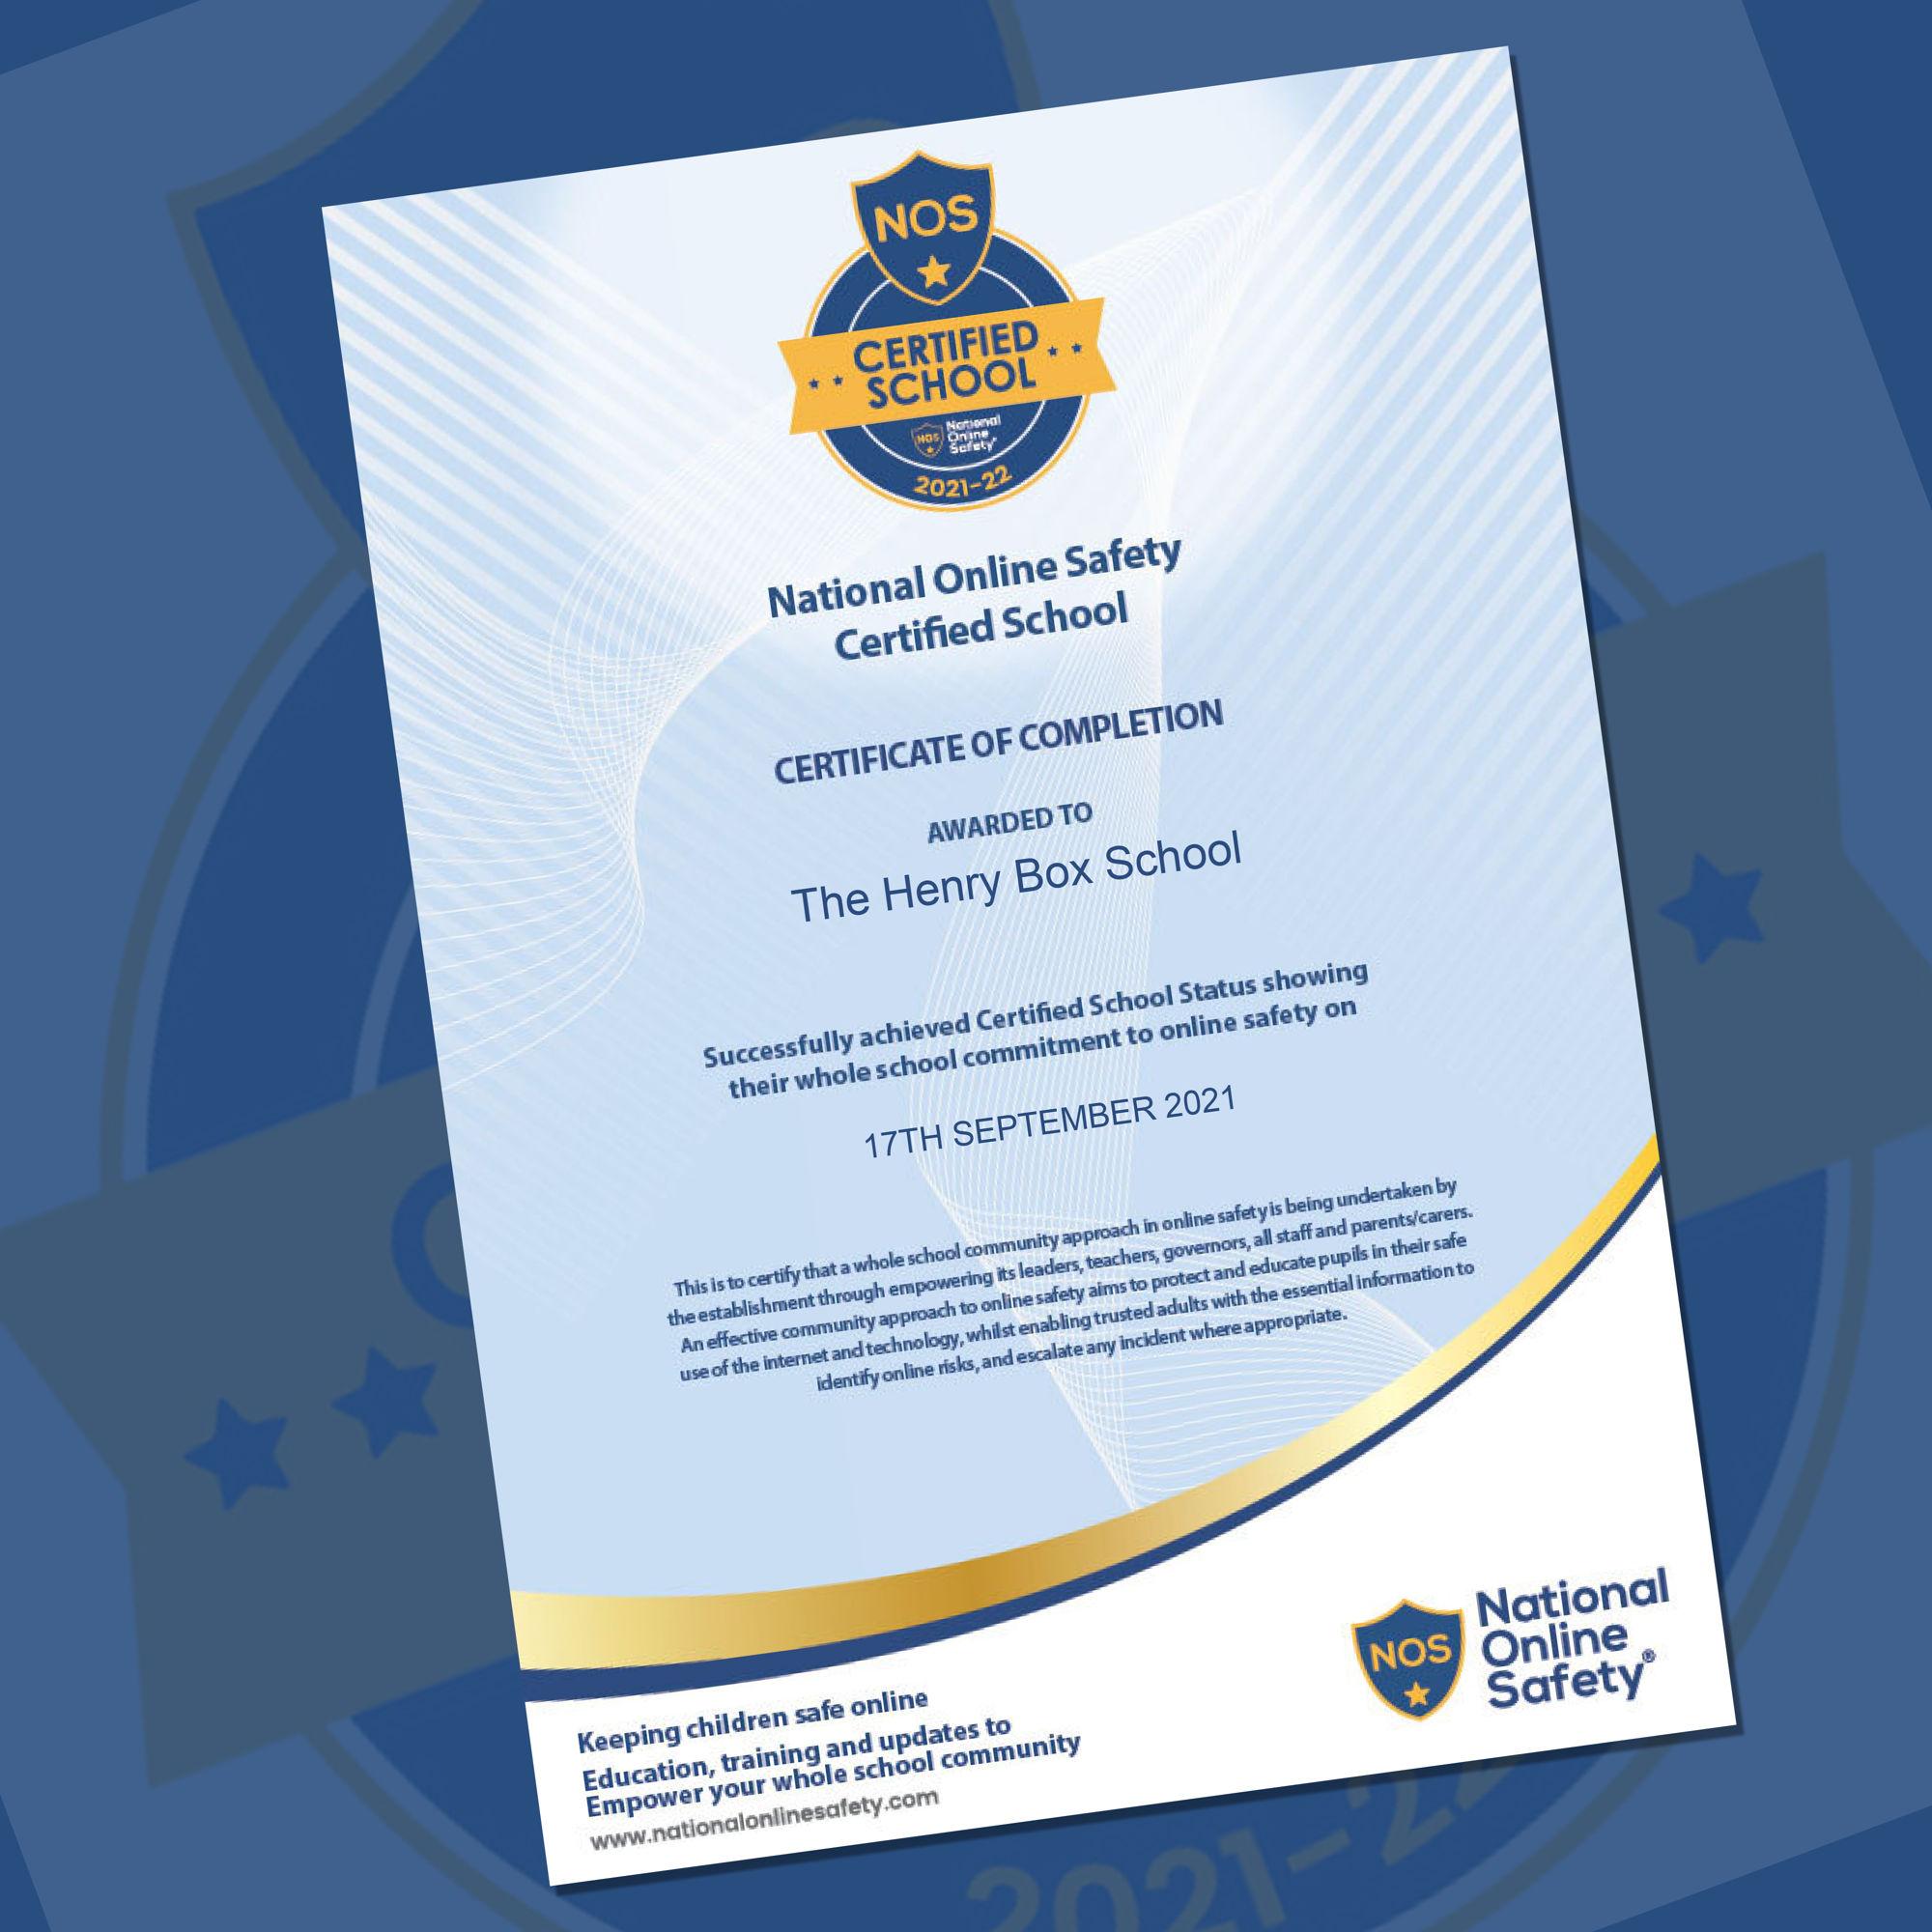 NOS   Certified Achool 2021 22 certoficate montage